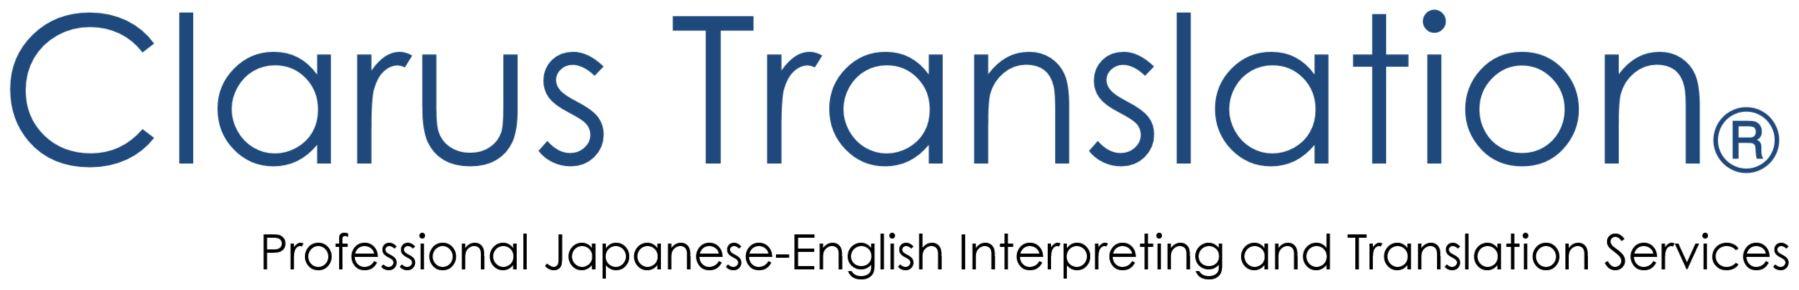 Professional Japanese-English Interpreting and Translation Services - Clarus Translation